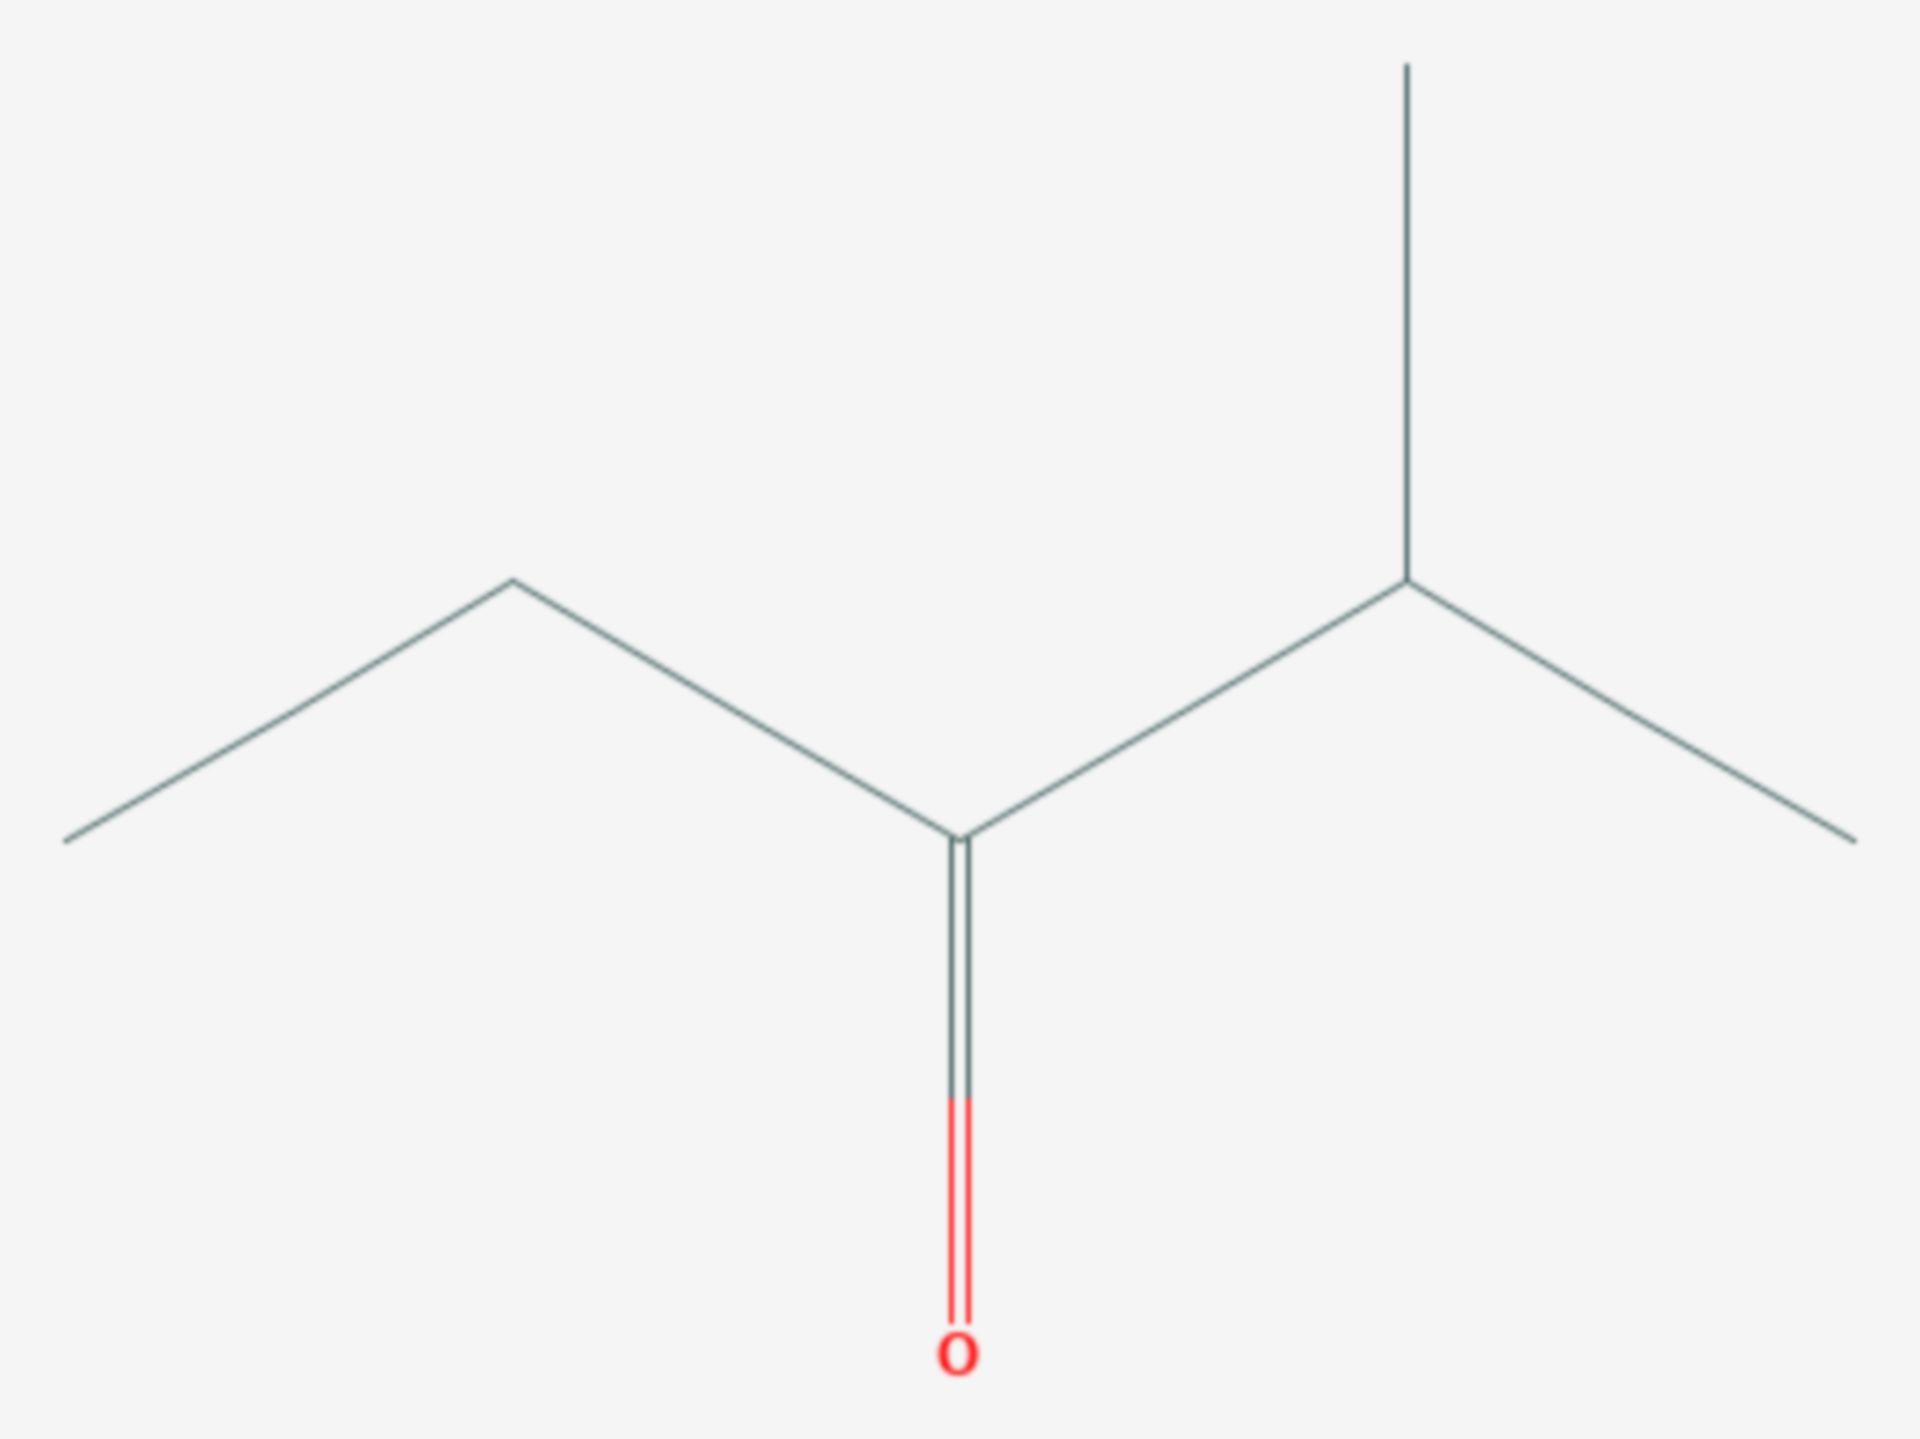 2-Methyl-3-pentanon (Strukturformel)